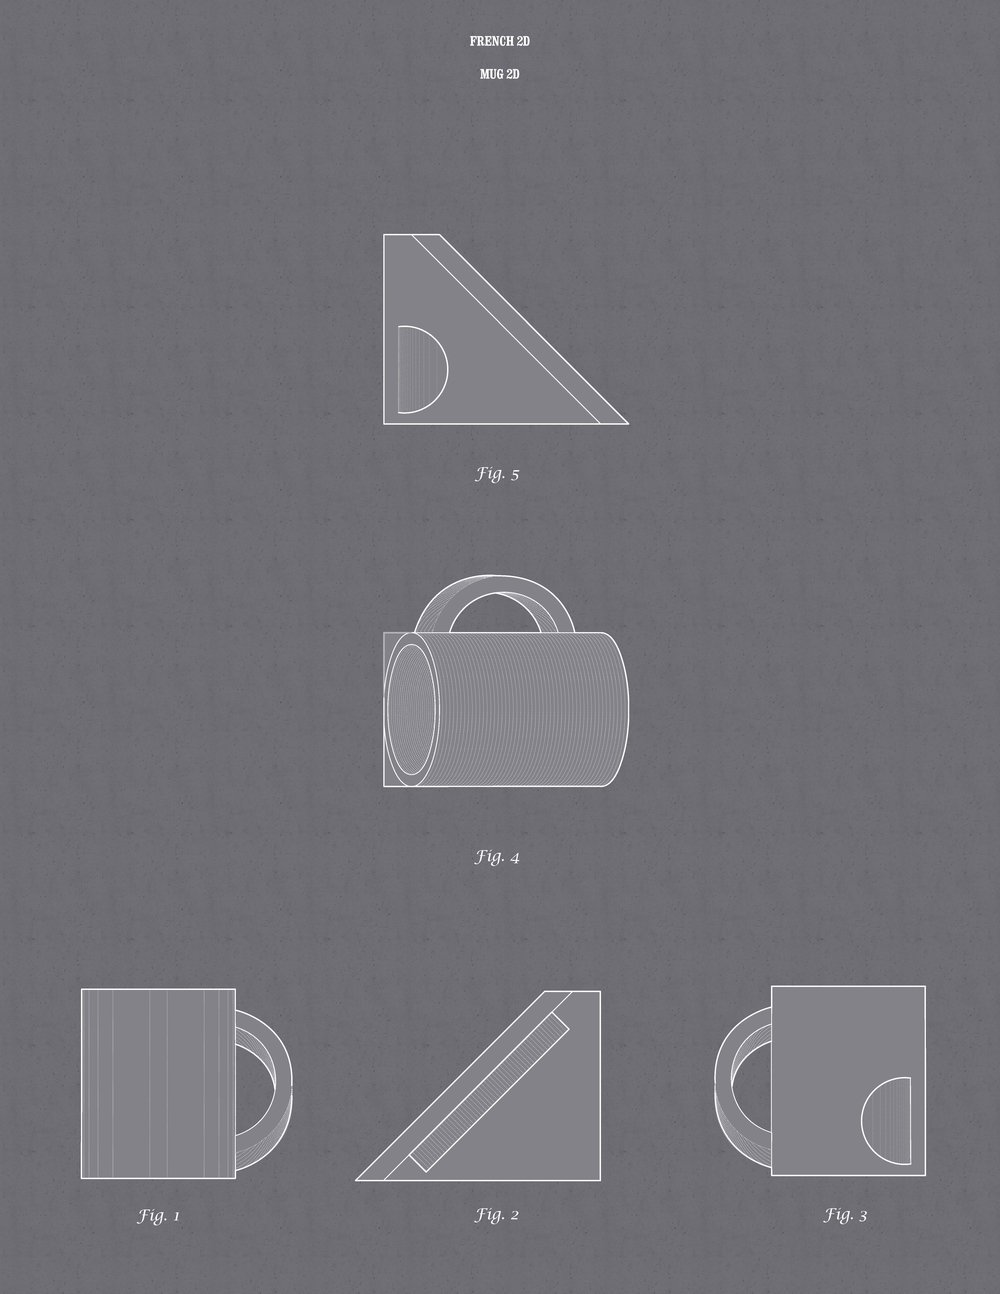 mug 2d patent blue.jpg